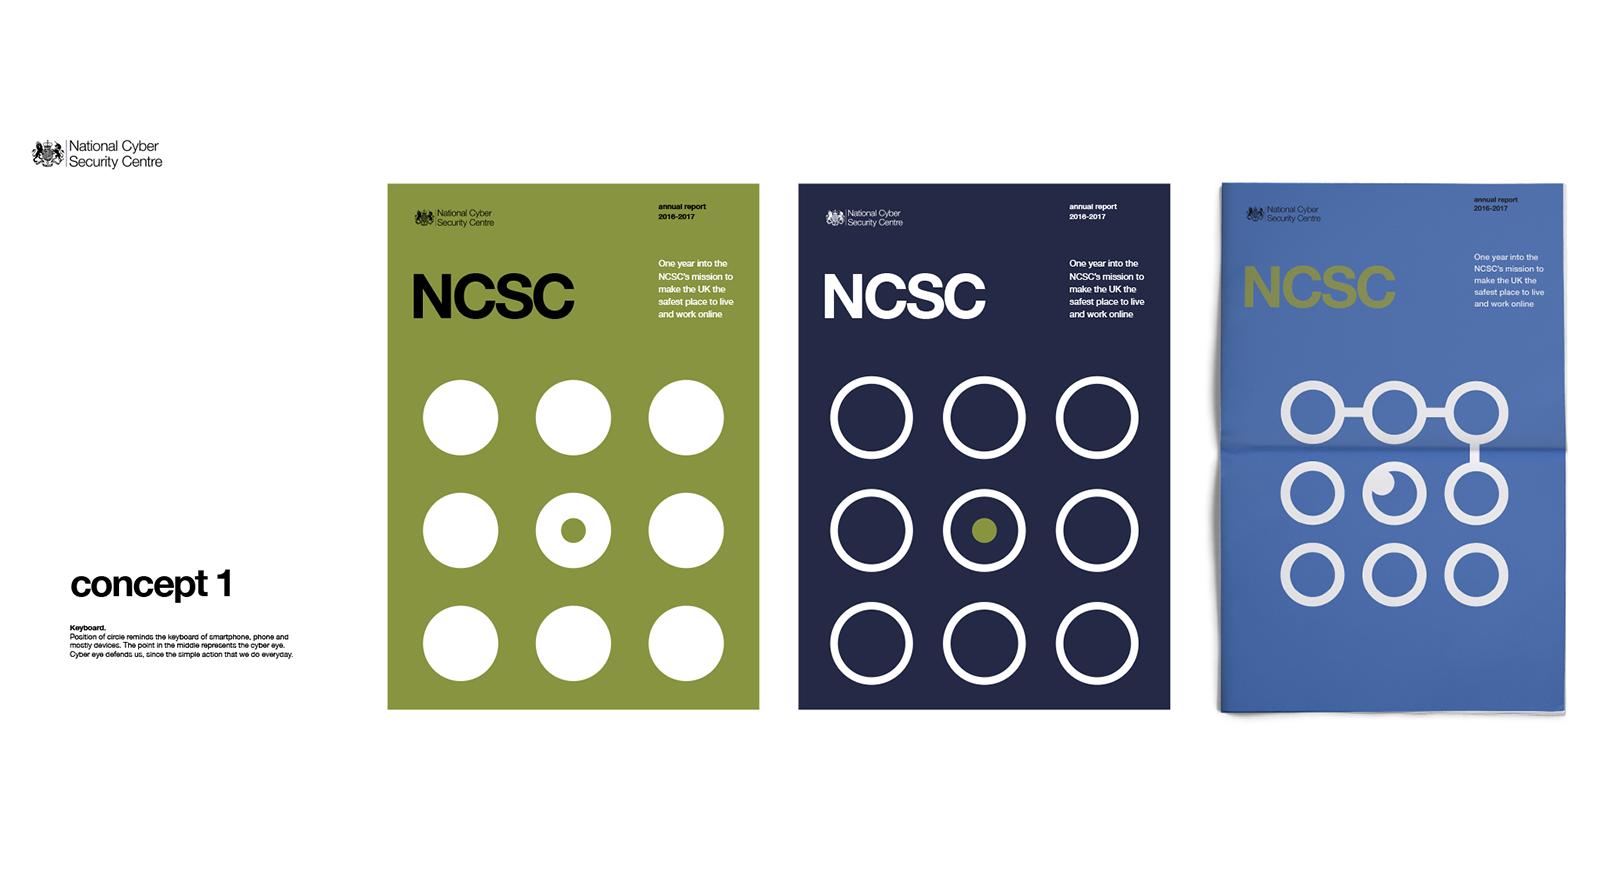 NCSC_AnnualReview_2